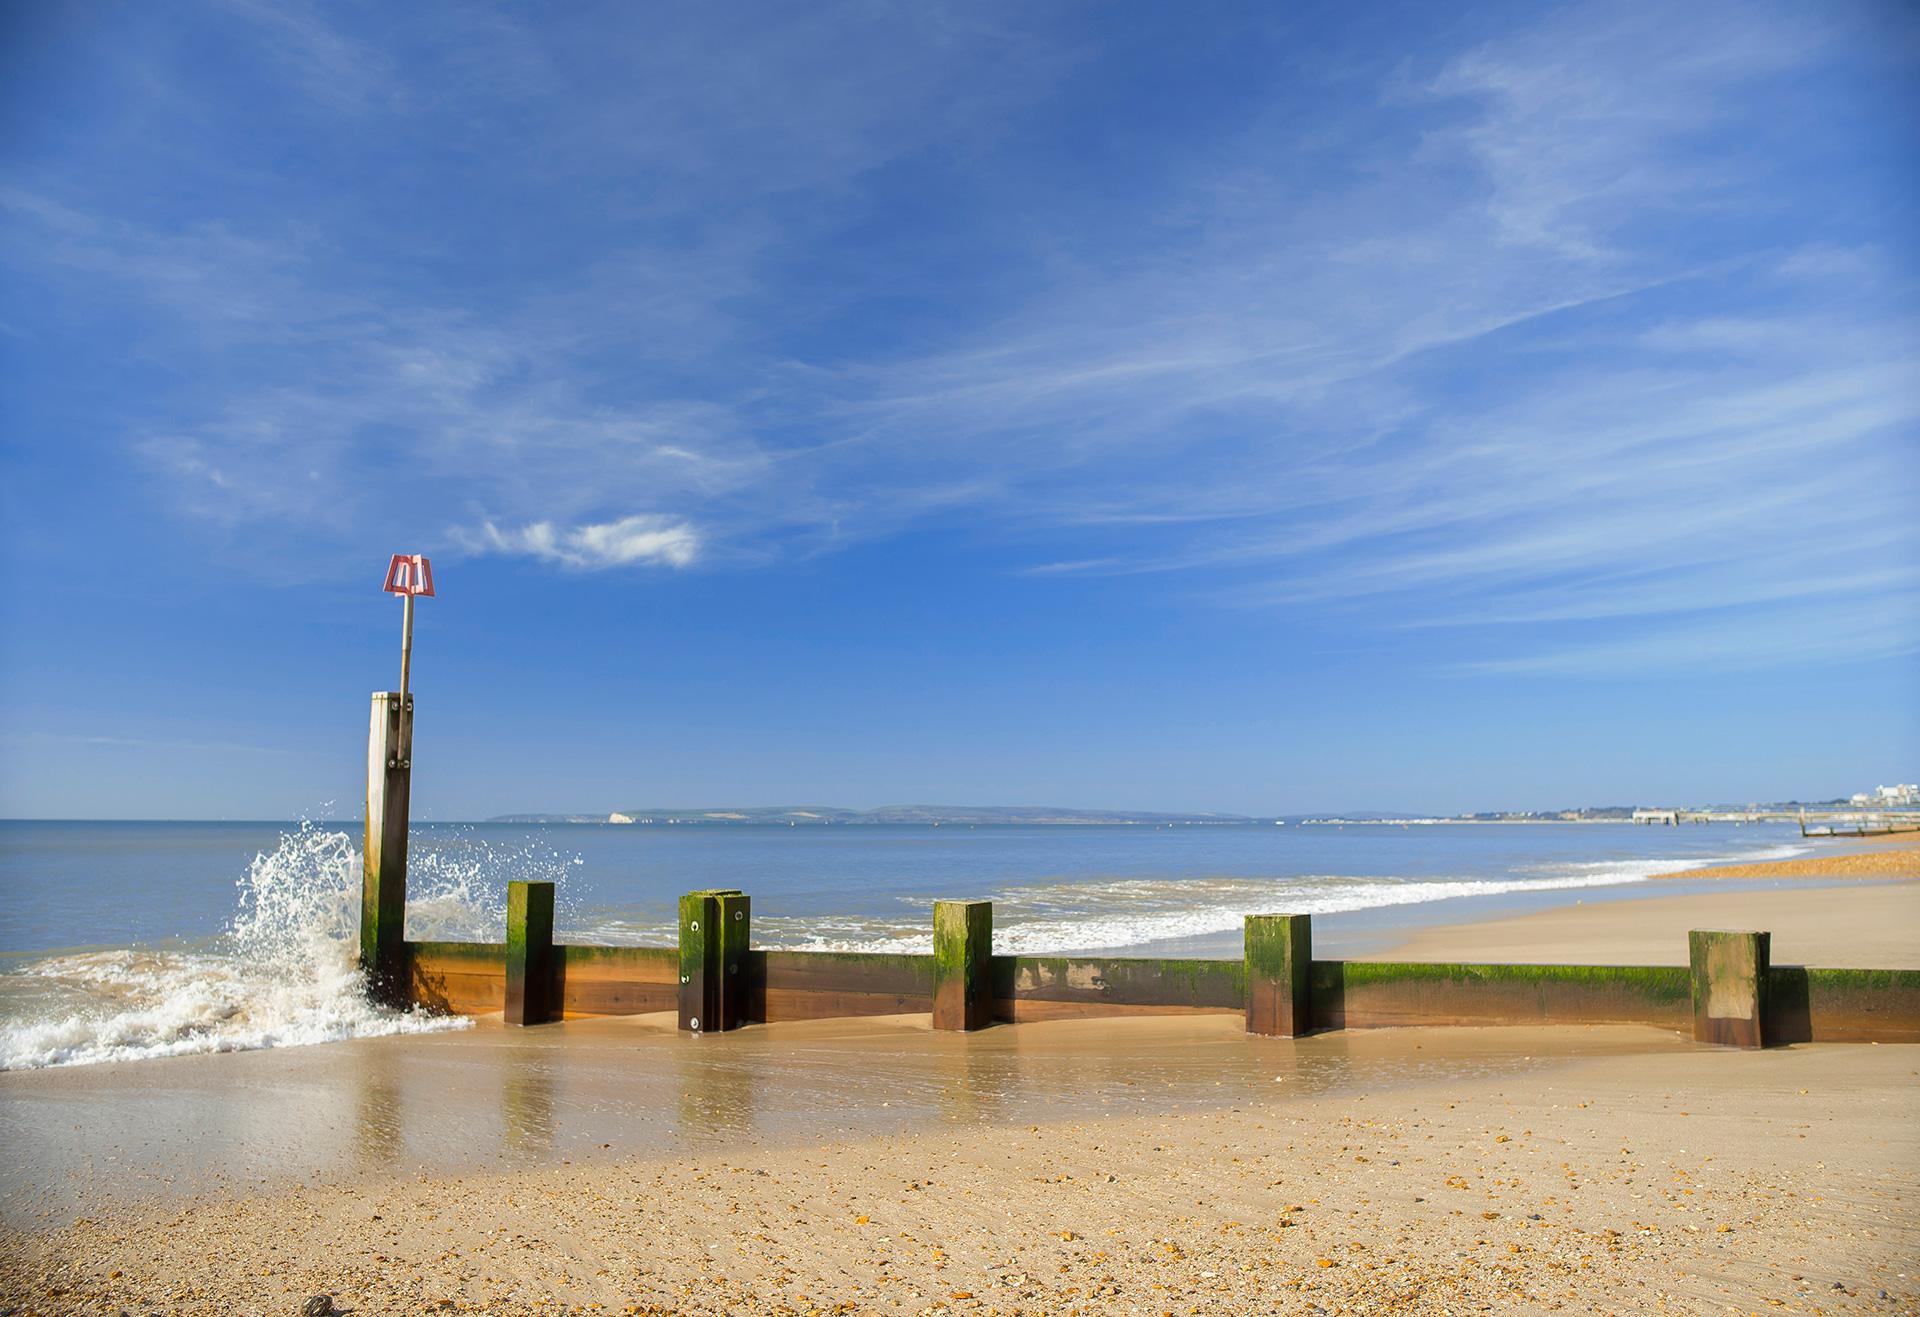 Waves crashing into the Groyne in boscombe